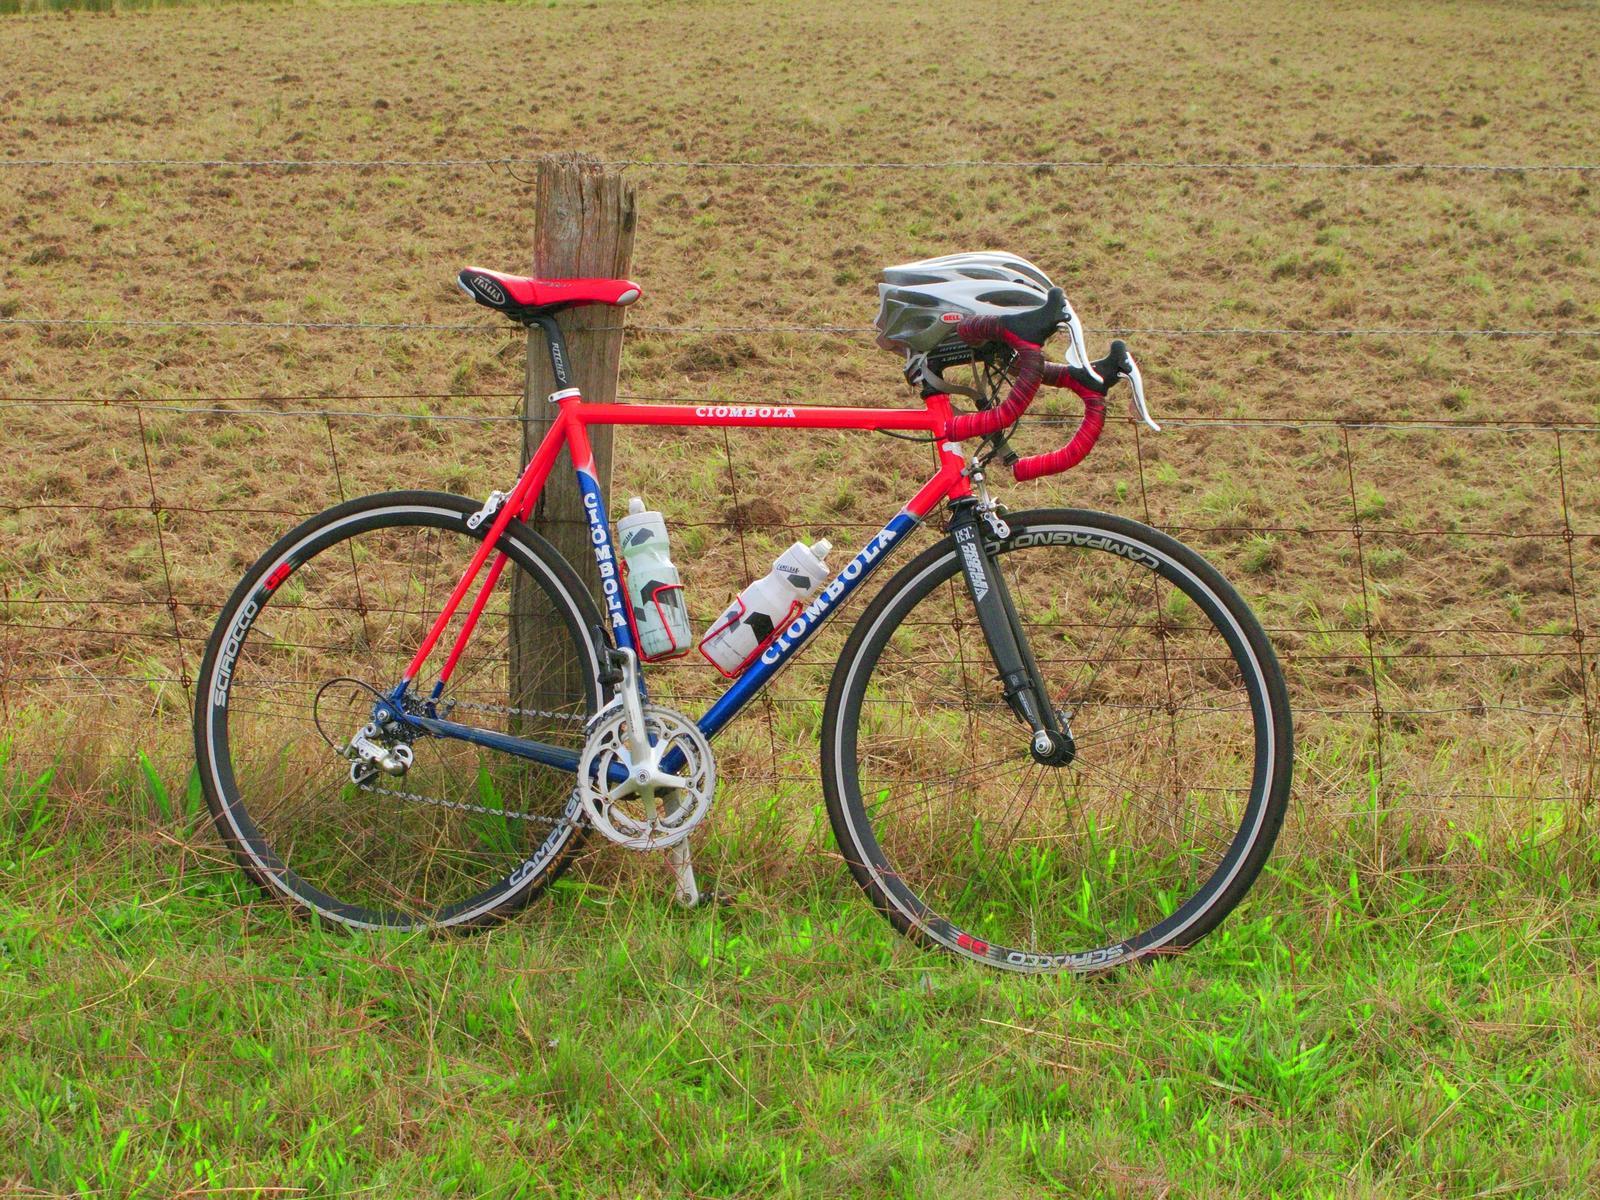 Ciombola-Bikes-22